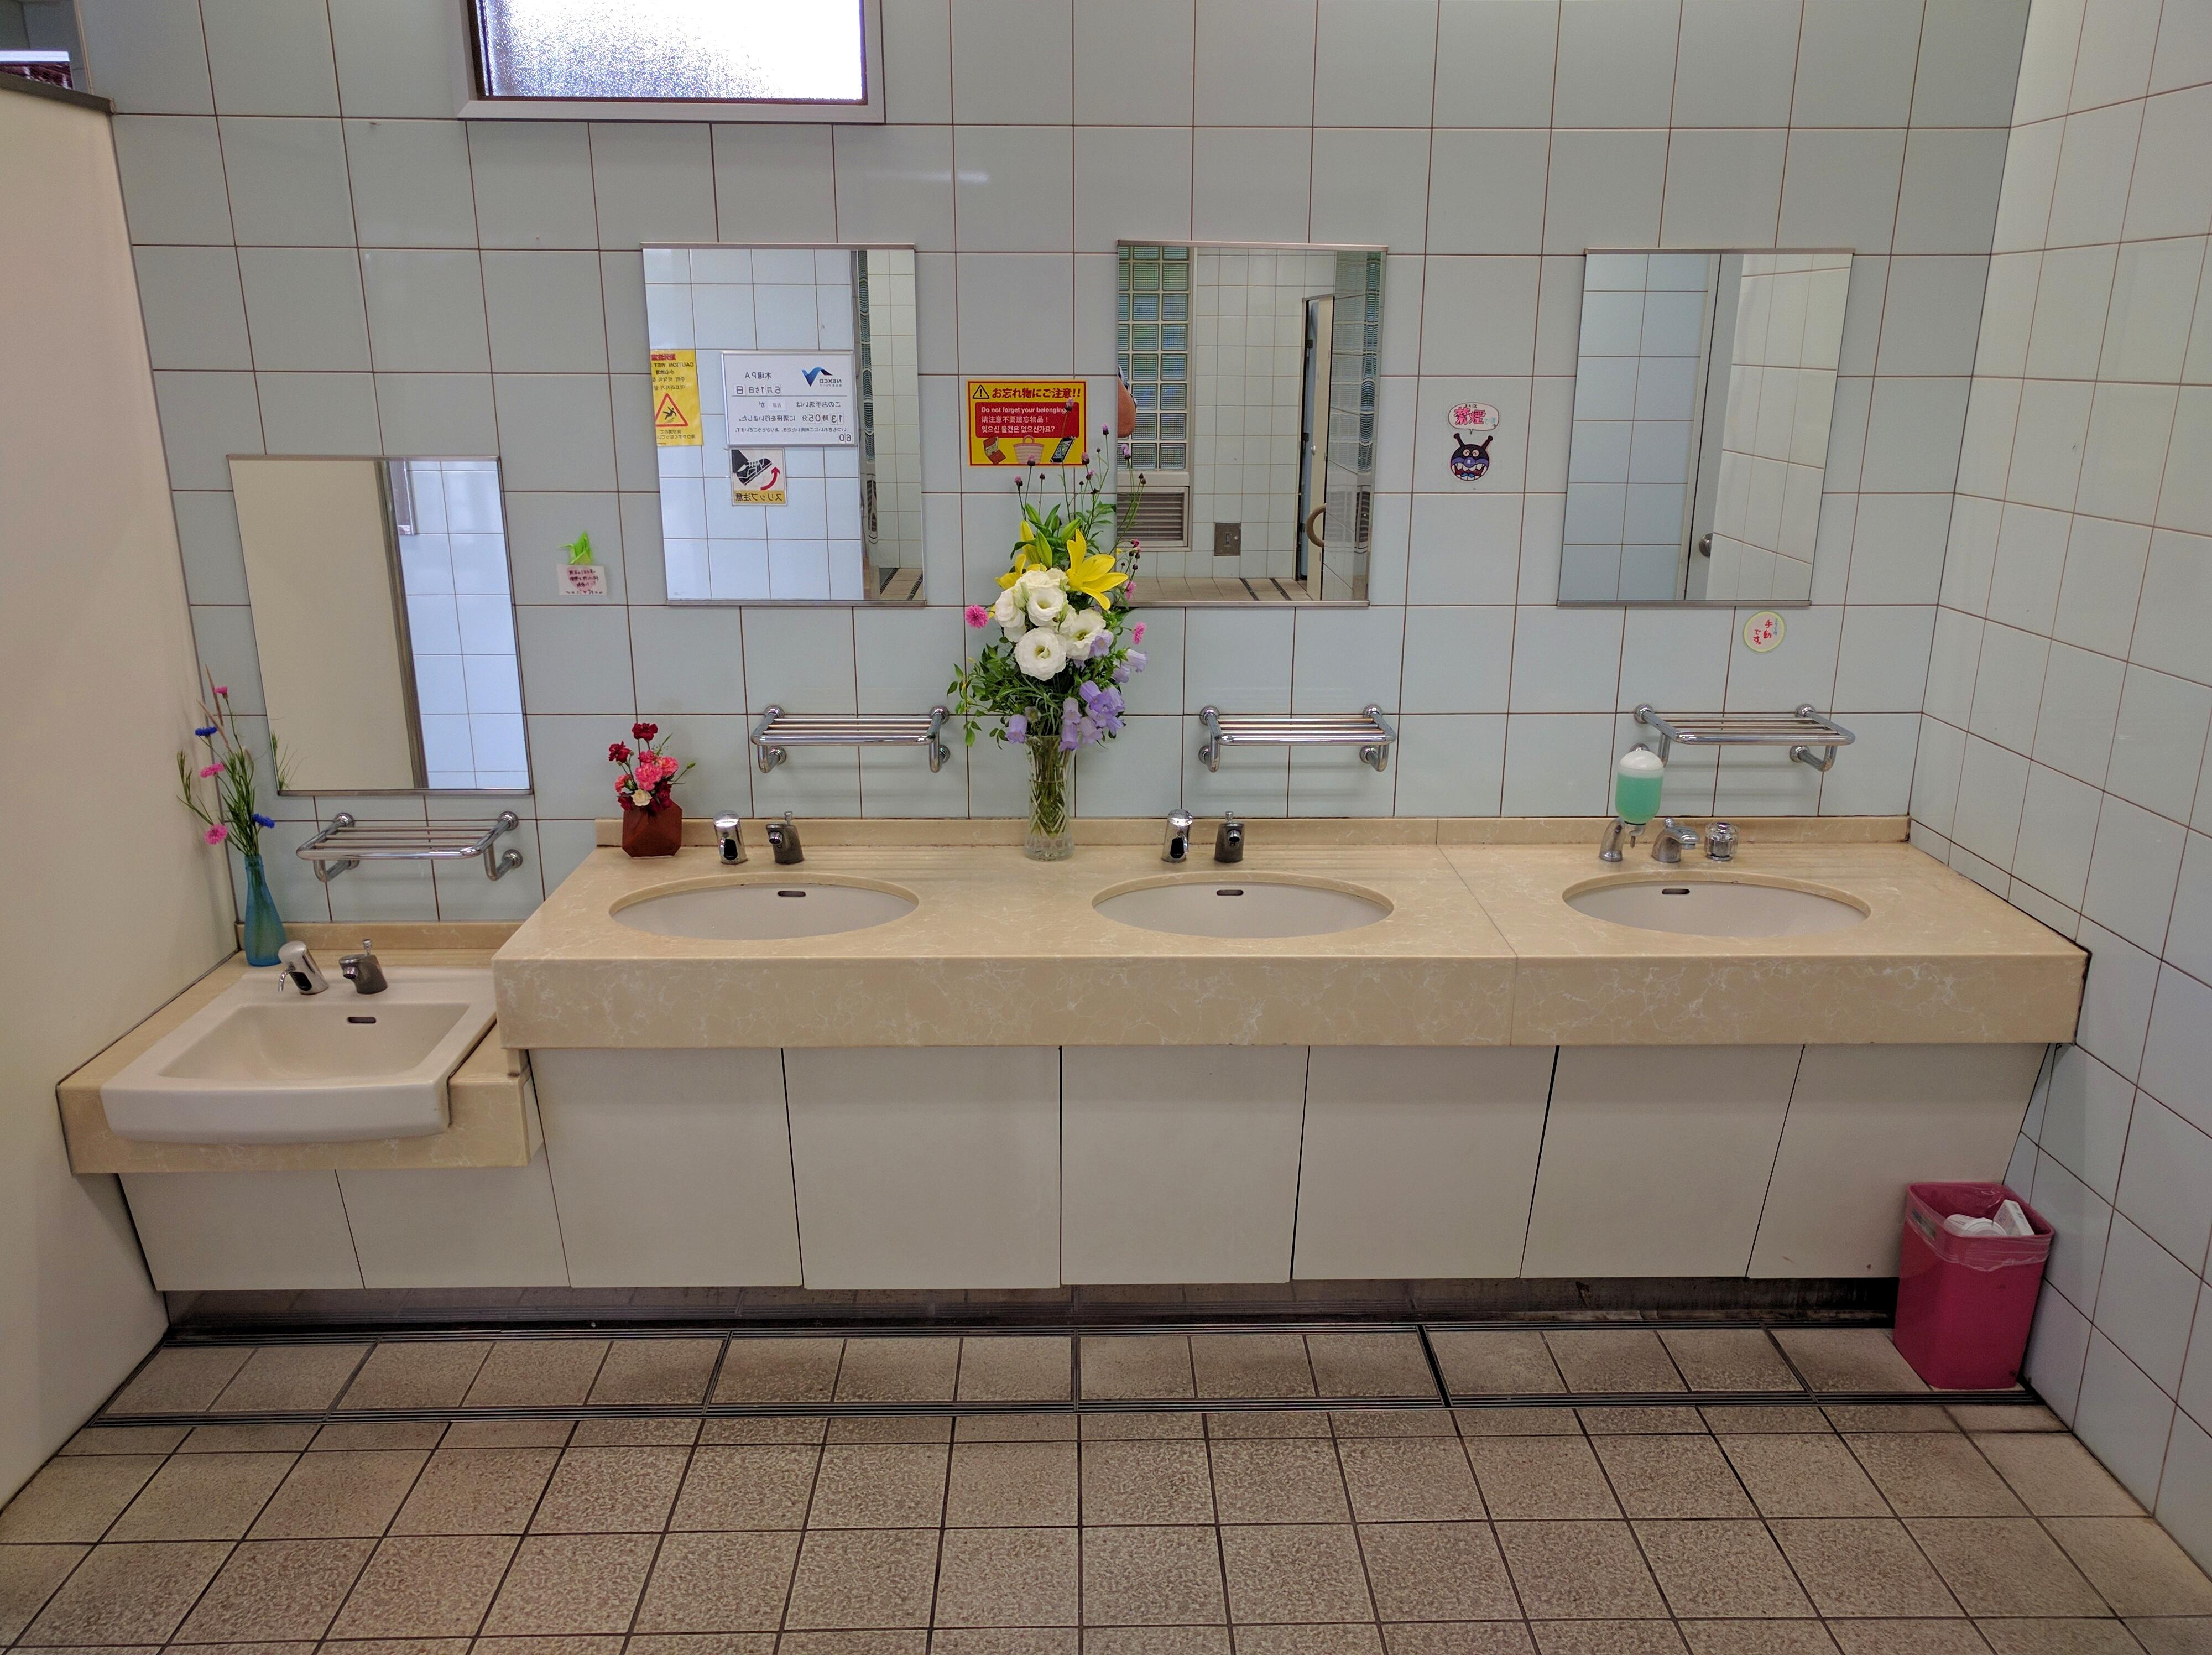 Public ToiletFull Resolution 4000 X 2992